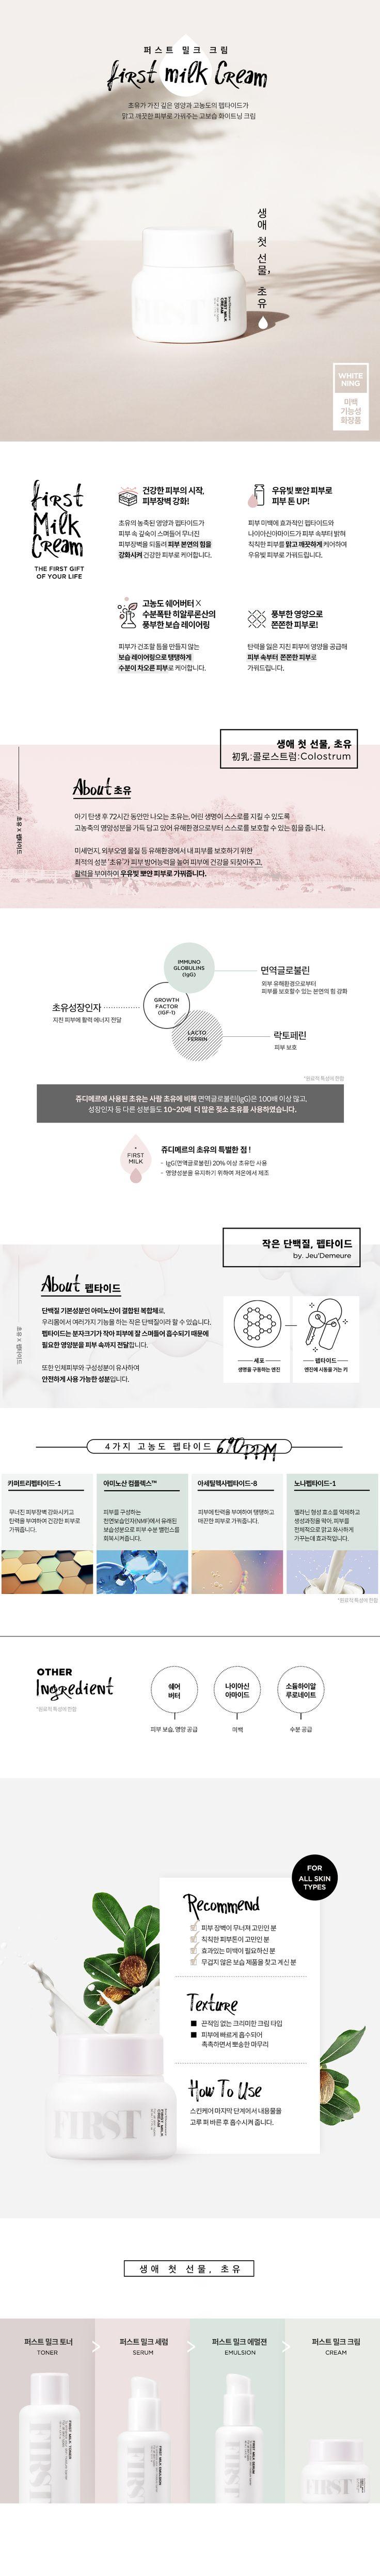 [jeu'demeure] web design detail information webpage layout cosmetic skincare brand cream 쥬디메르 화장품 상세 페이지 웹 디자인 @chloe__seul